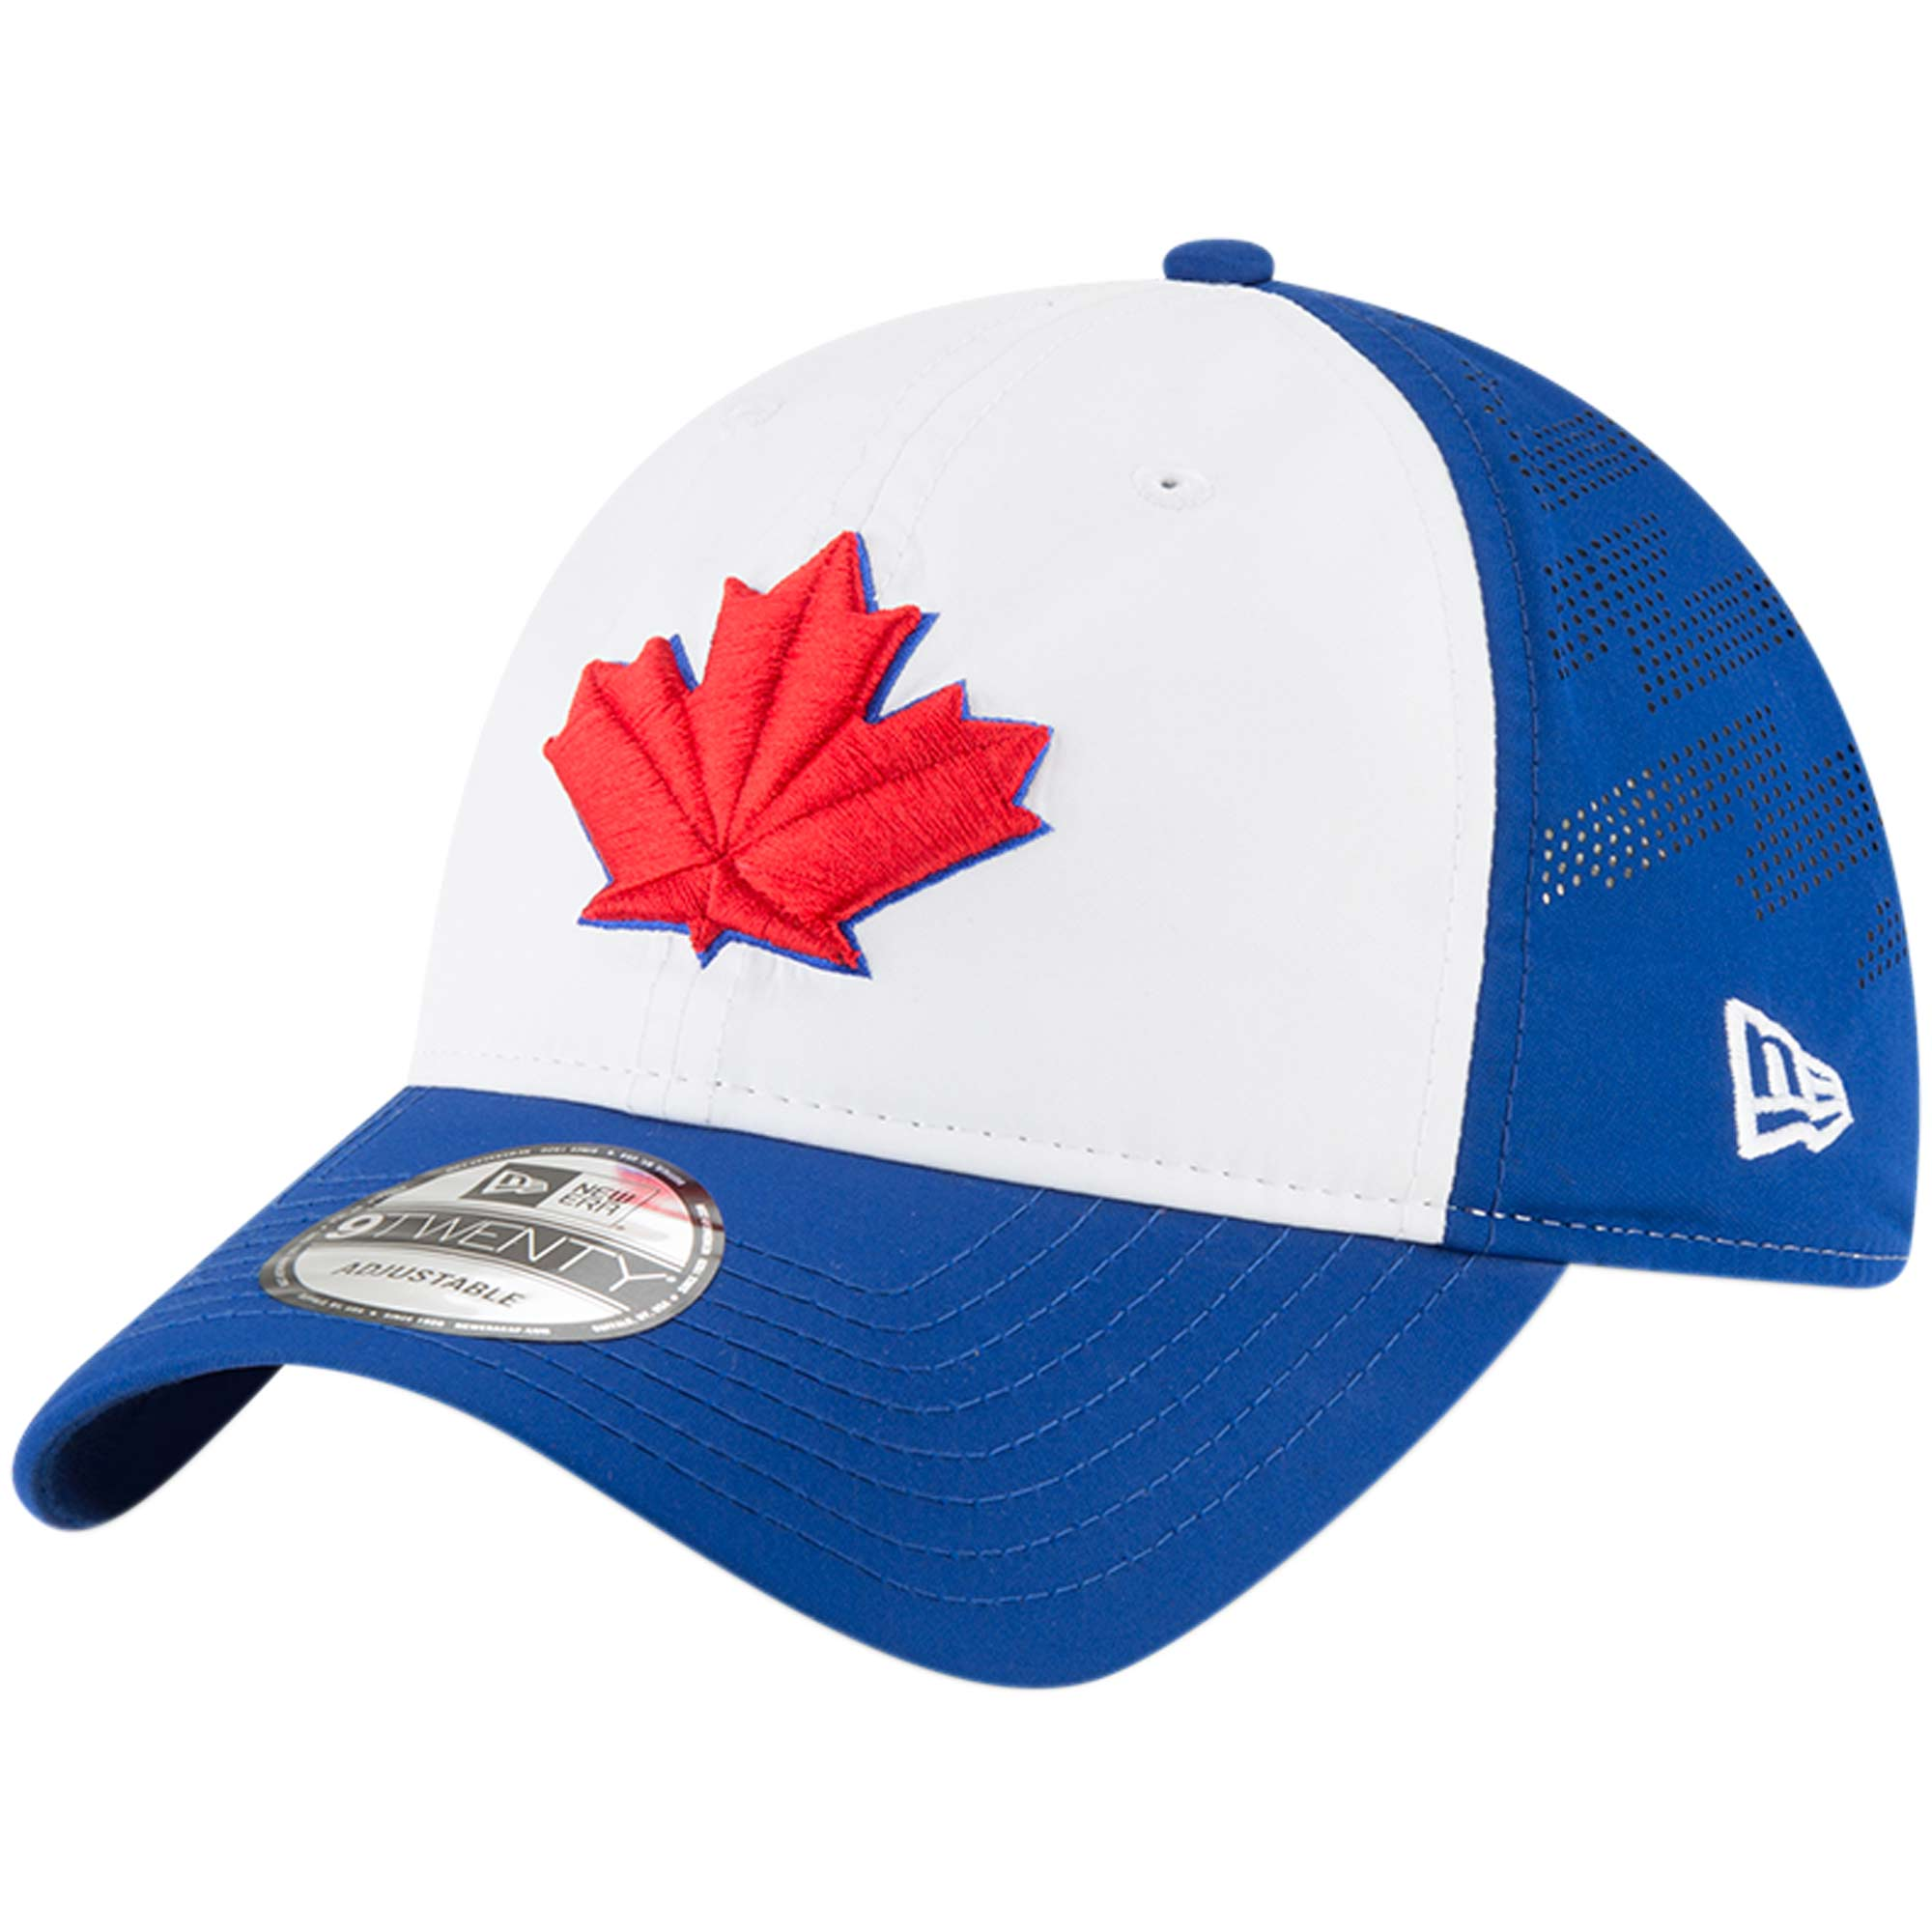 Toronto Blue Jays New Era Prolight Batting Practice 9TWENTY Adjustable Hat - White/Royal - OSFA